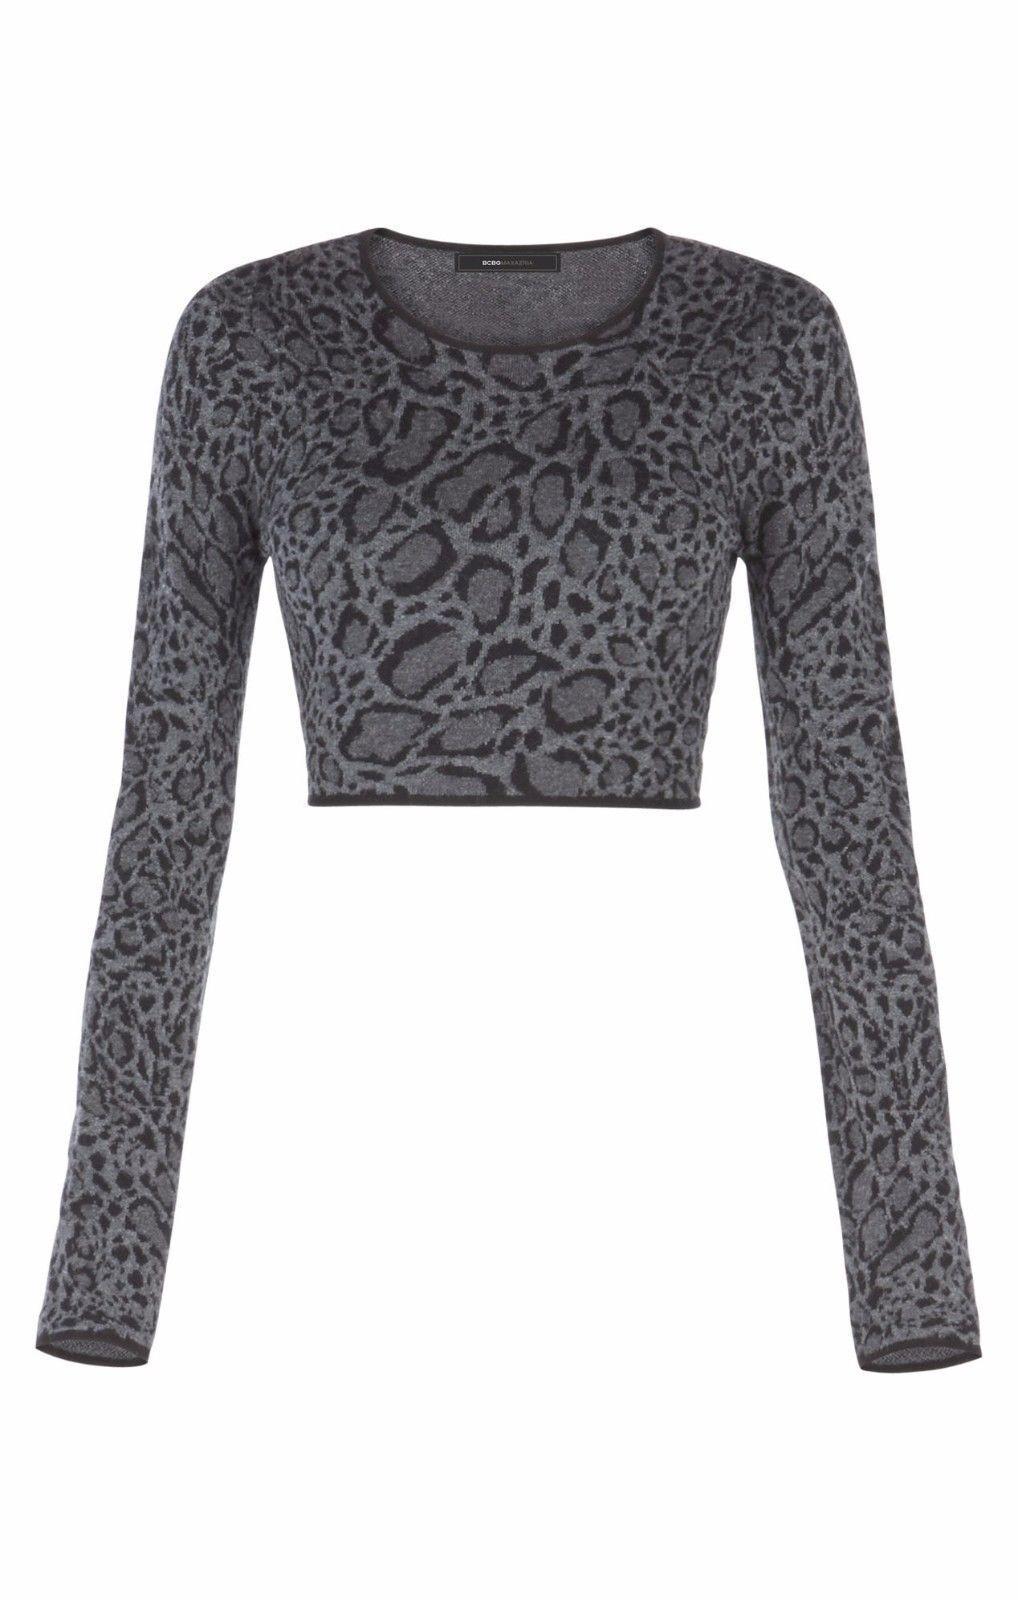 BCBG Max Azria HAYDEE Crop Top Leopard Ocelot Jacquard Cropped Sweater Größe M